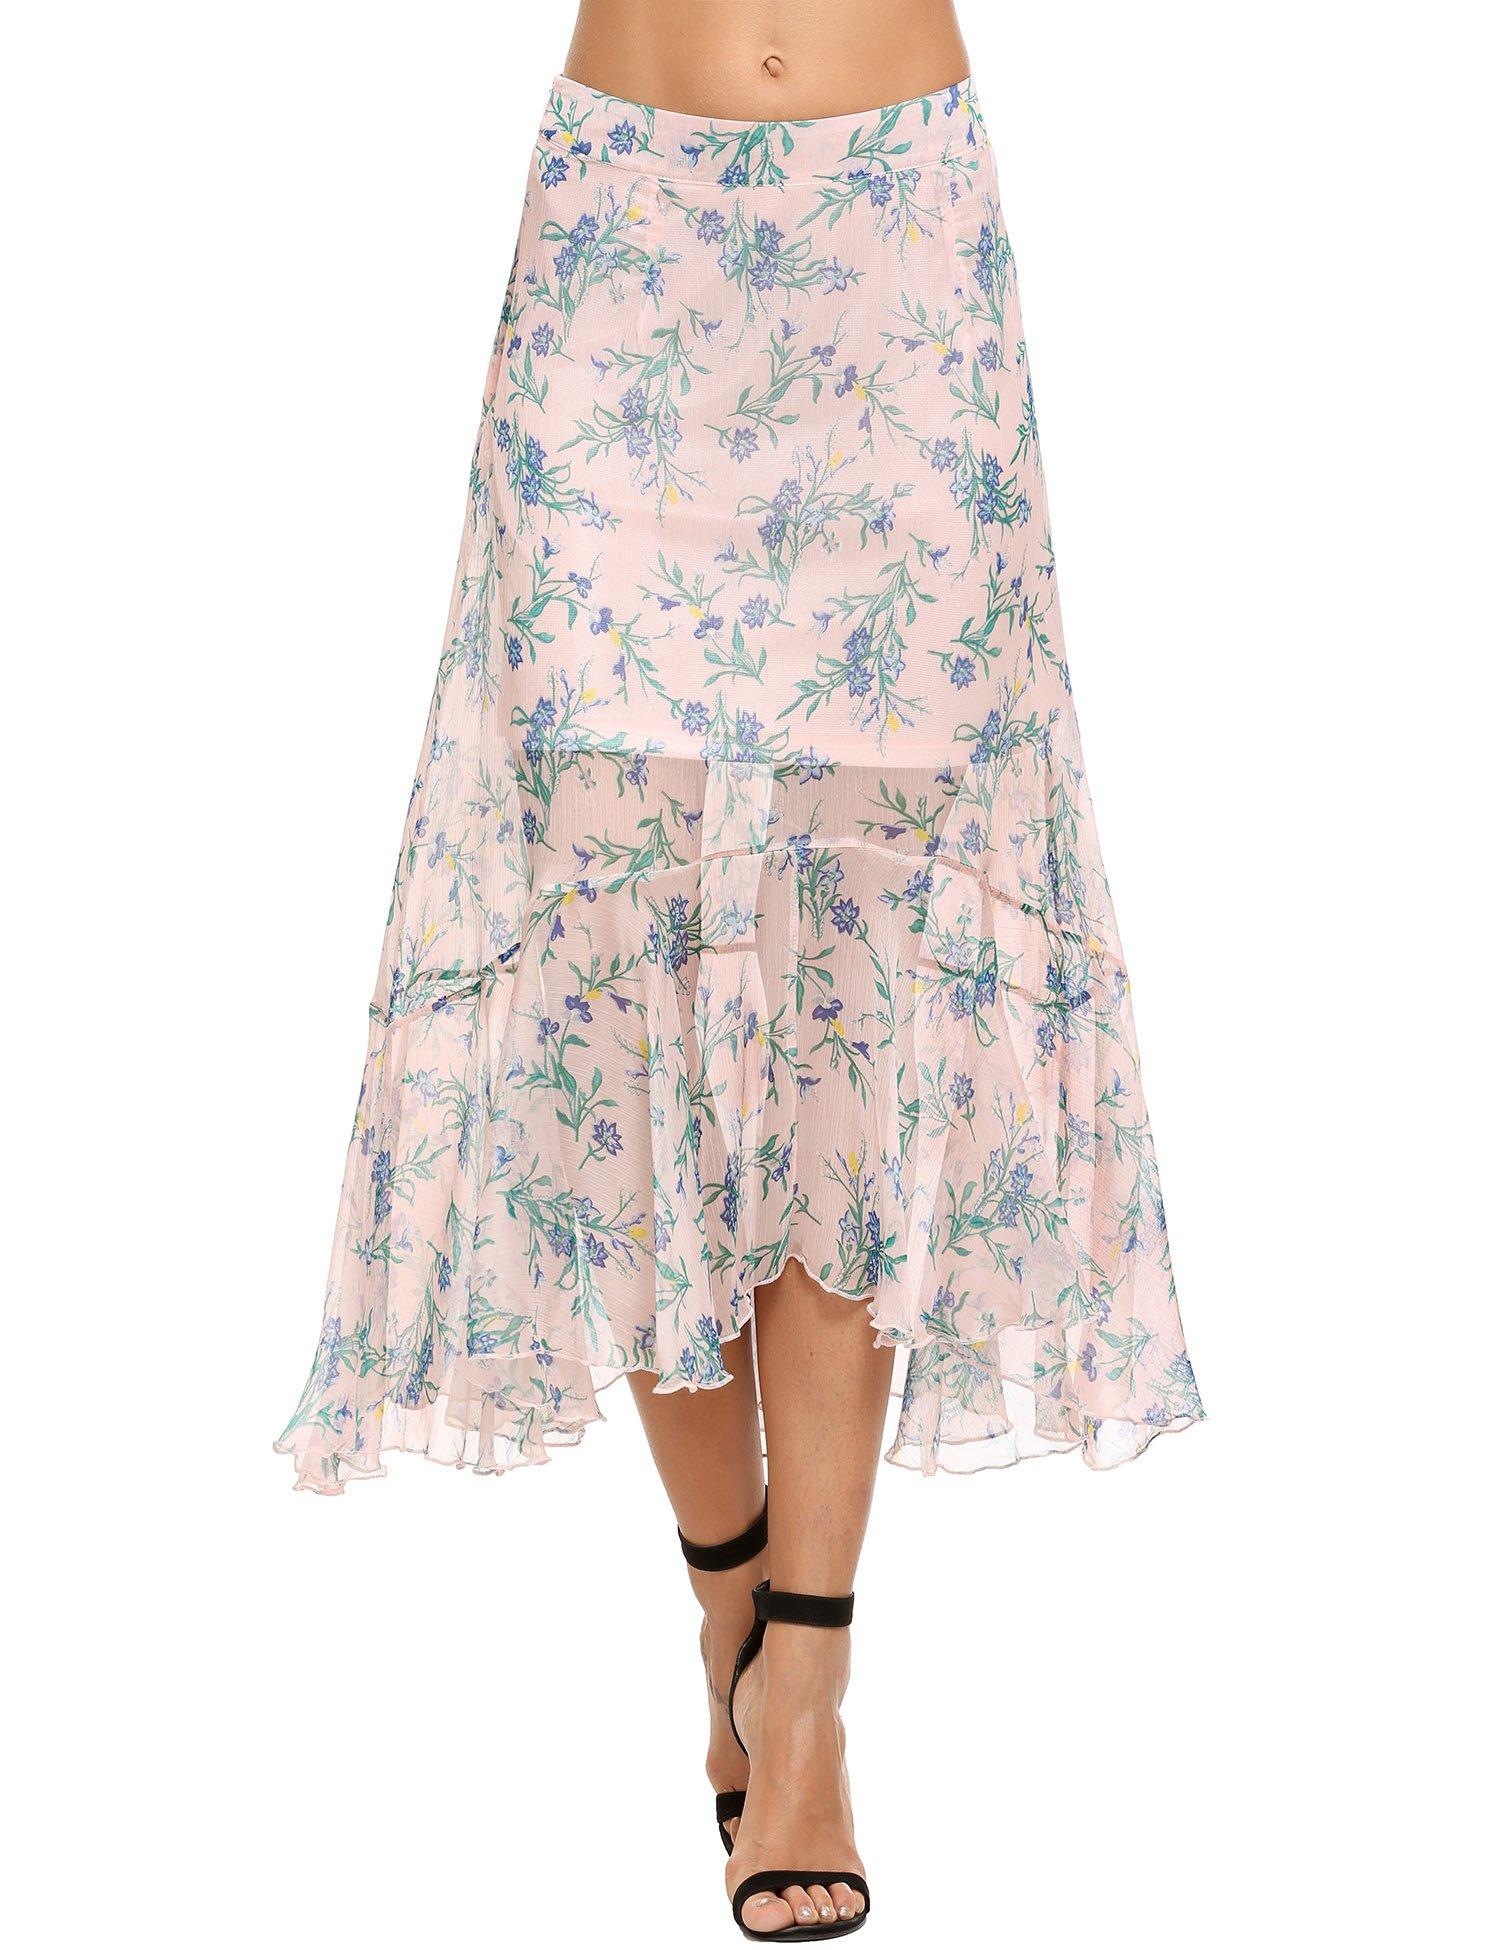 Zeagoo Women's Retro Vintage Summer Chiffon Pleat Long Skirt